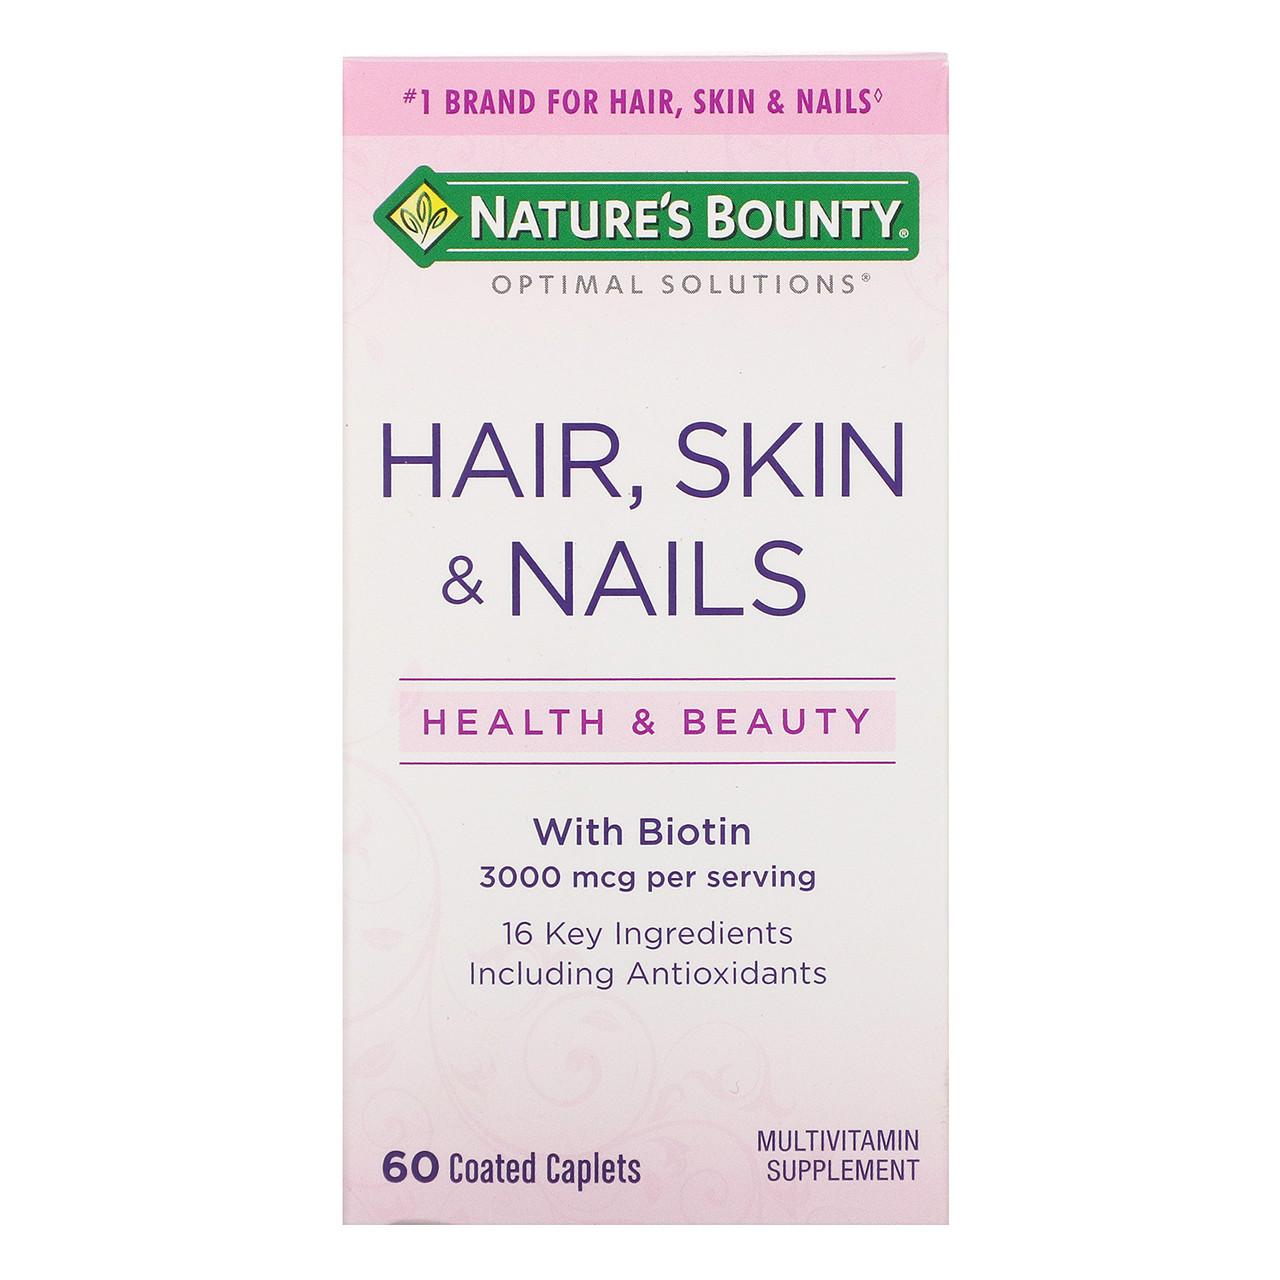 Витамины для волос и ногтей Nature's Bounty Hair, Skin & Nails